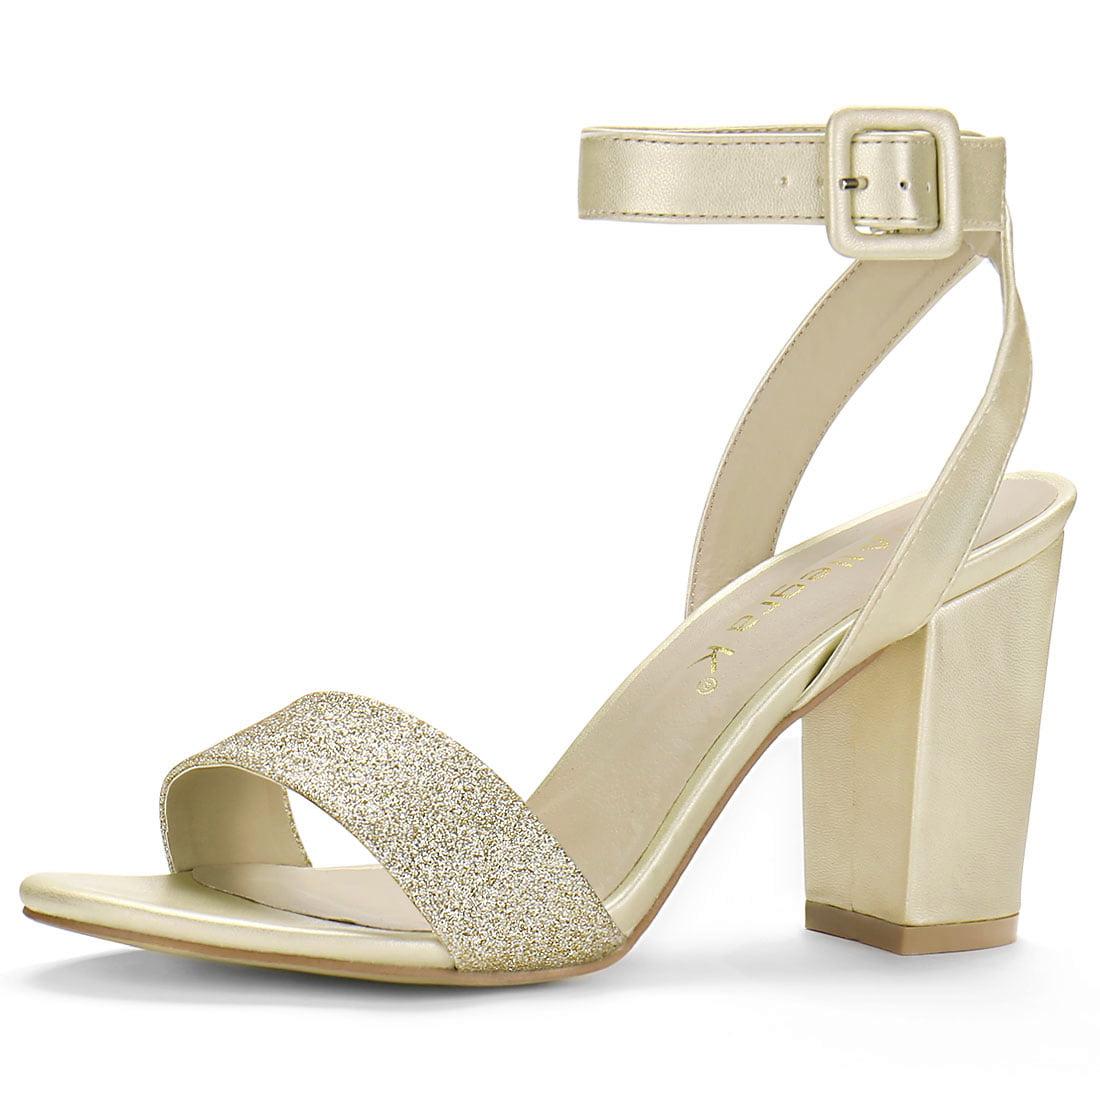 97010e576e9 0142H Woman Glitter Vamp Chunky Heel Ankle Strap Sandals Gold ...